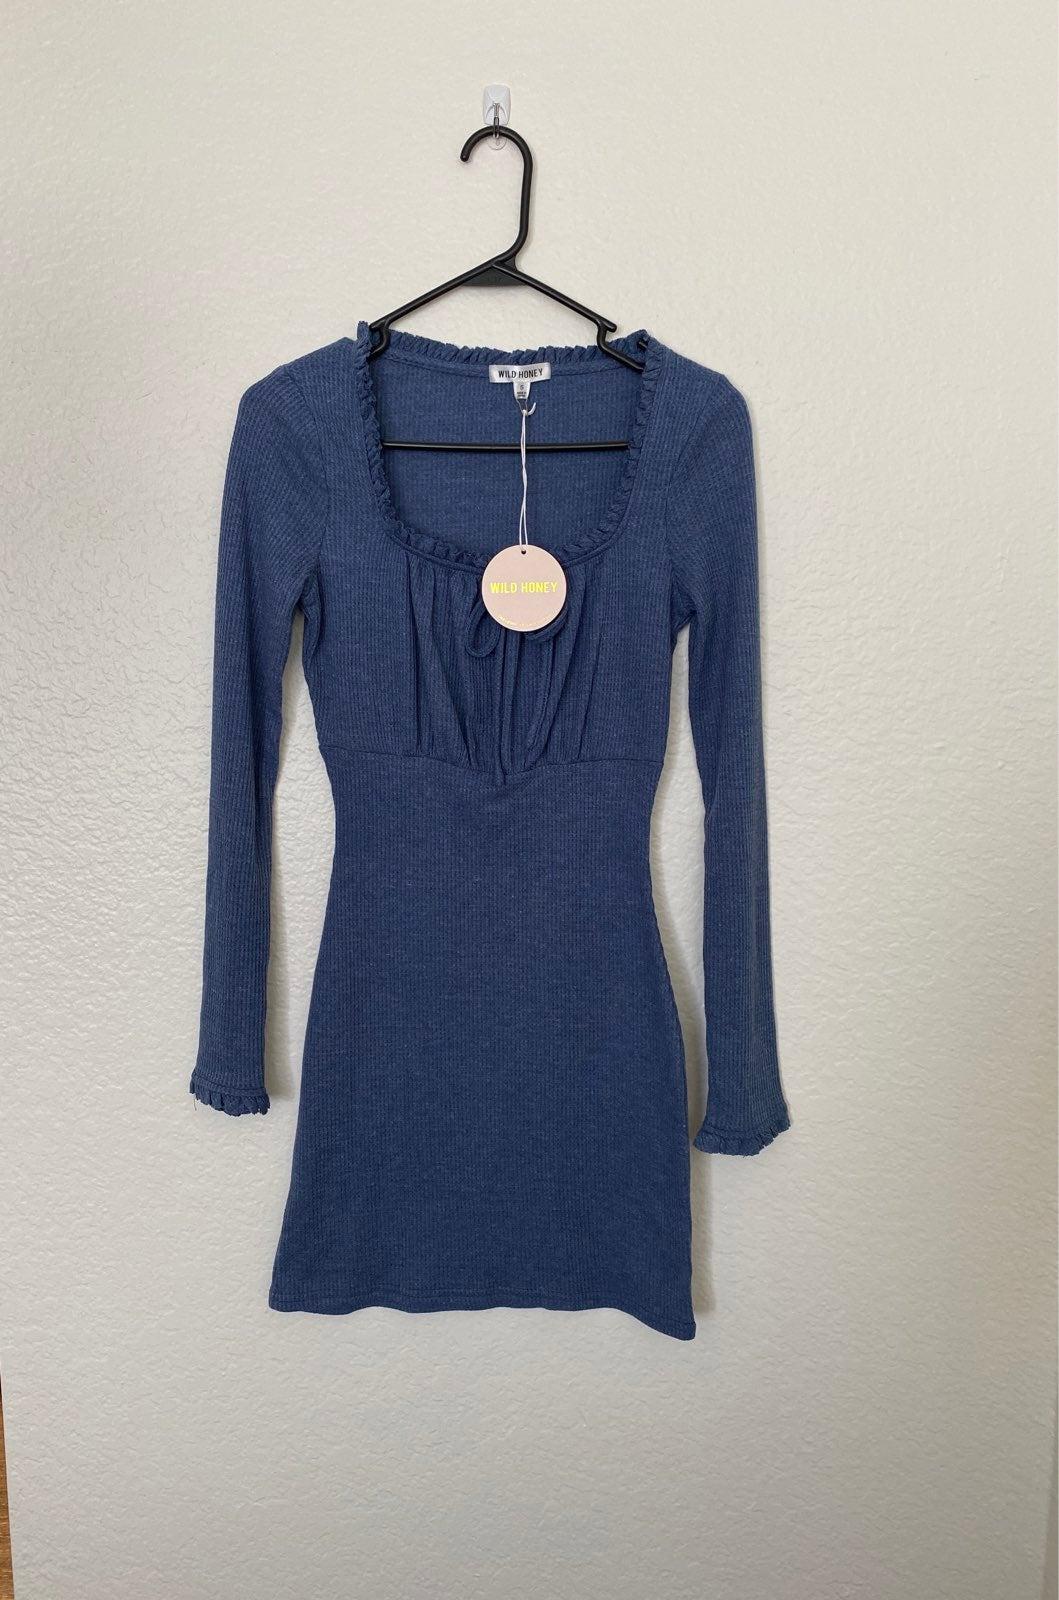 Lauras Boutique Blue Ribbed Mini Dress